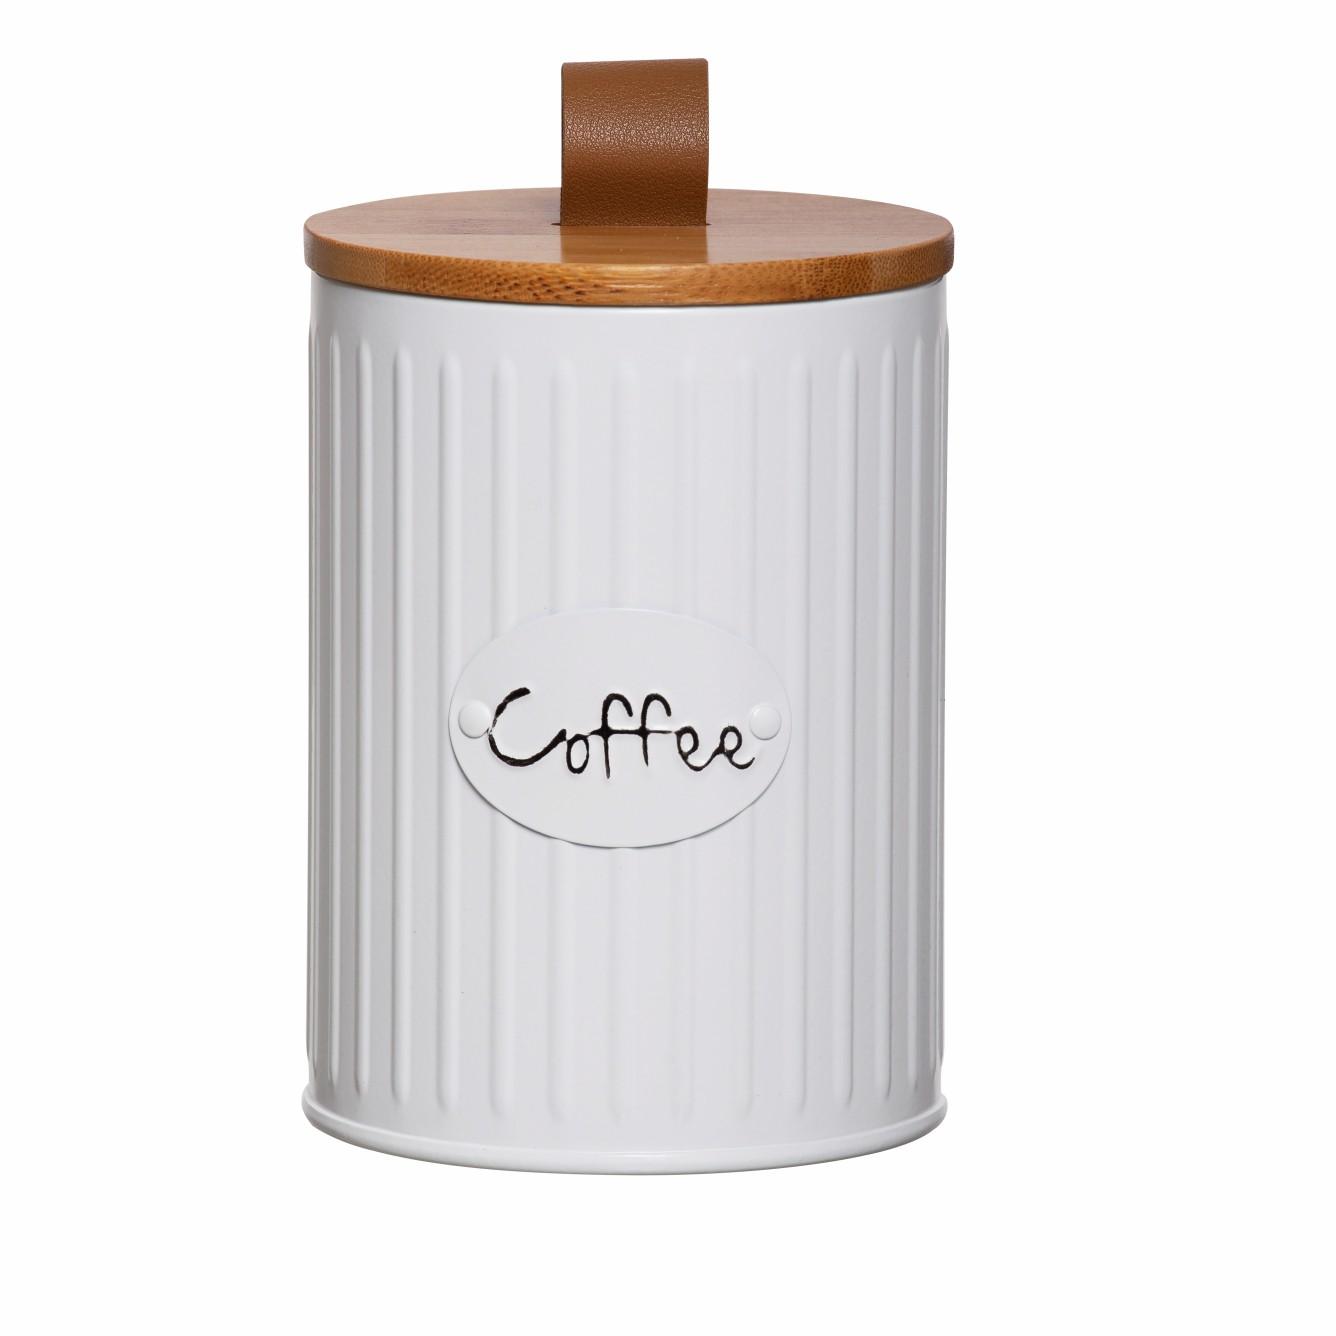 Pote de Mantimento Coffee Lisse - YOI